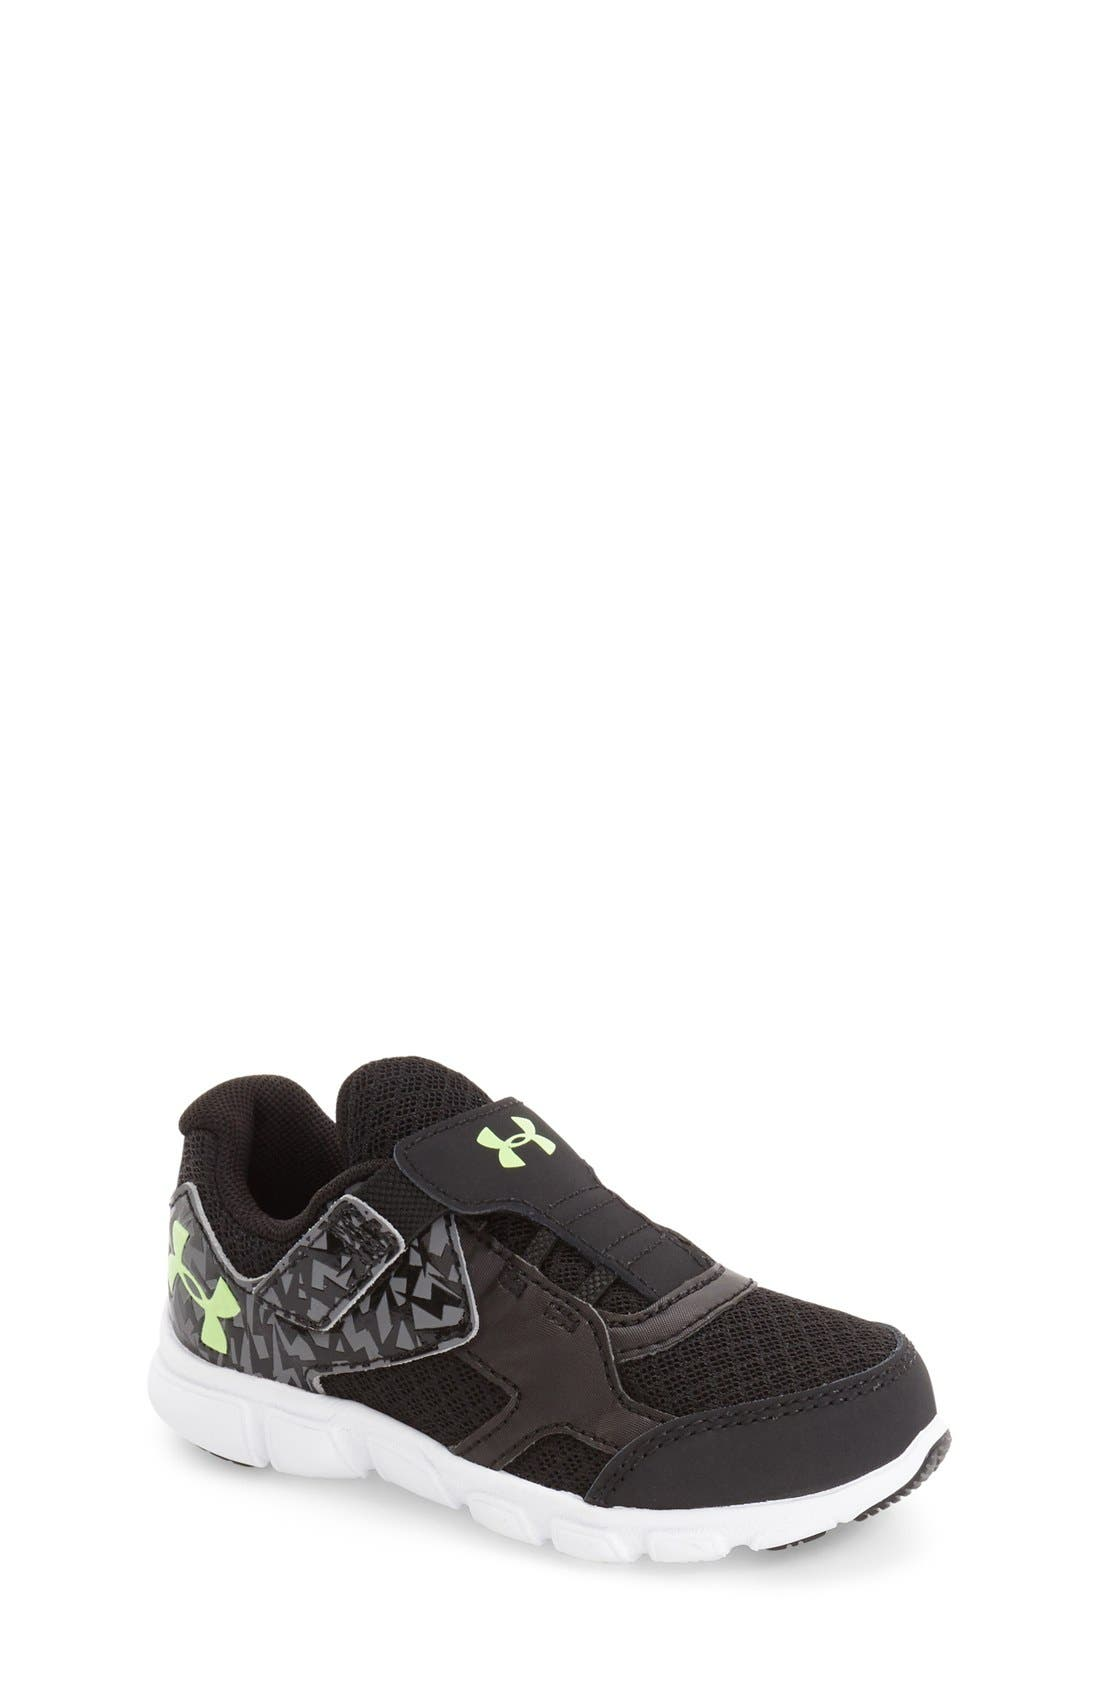 Alternate Image 1 Selected - Under Armour Engage II Athletic Shoe (Walker & Toddler)